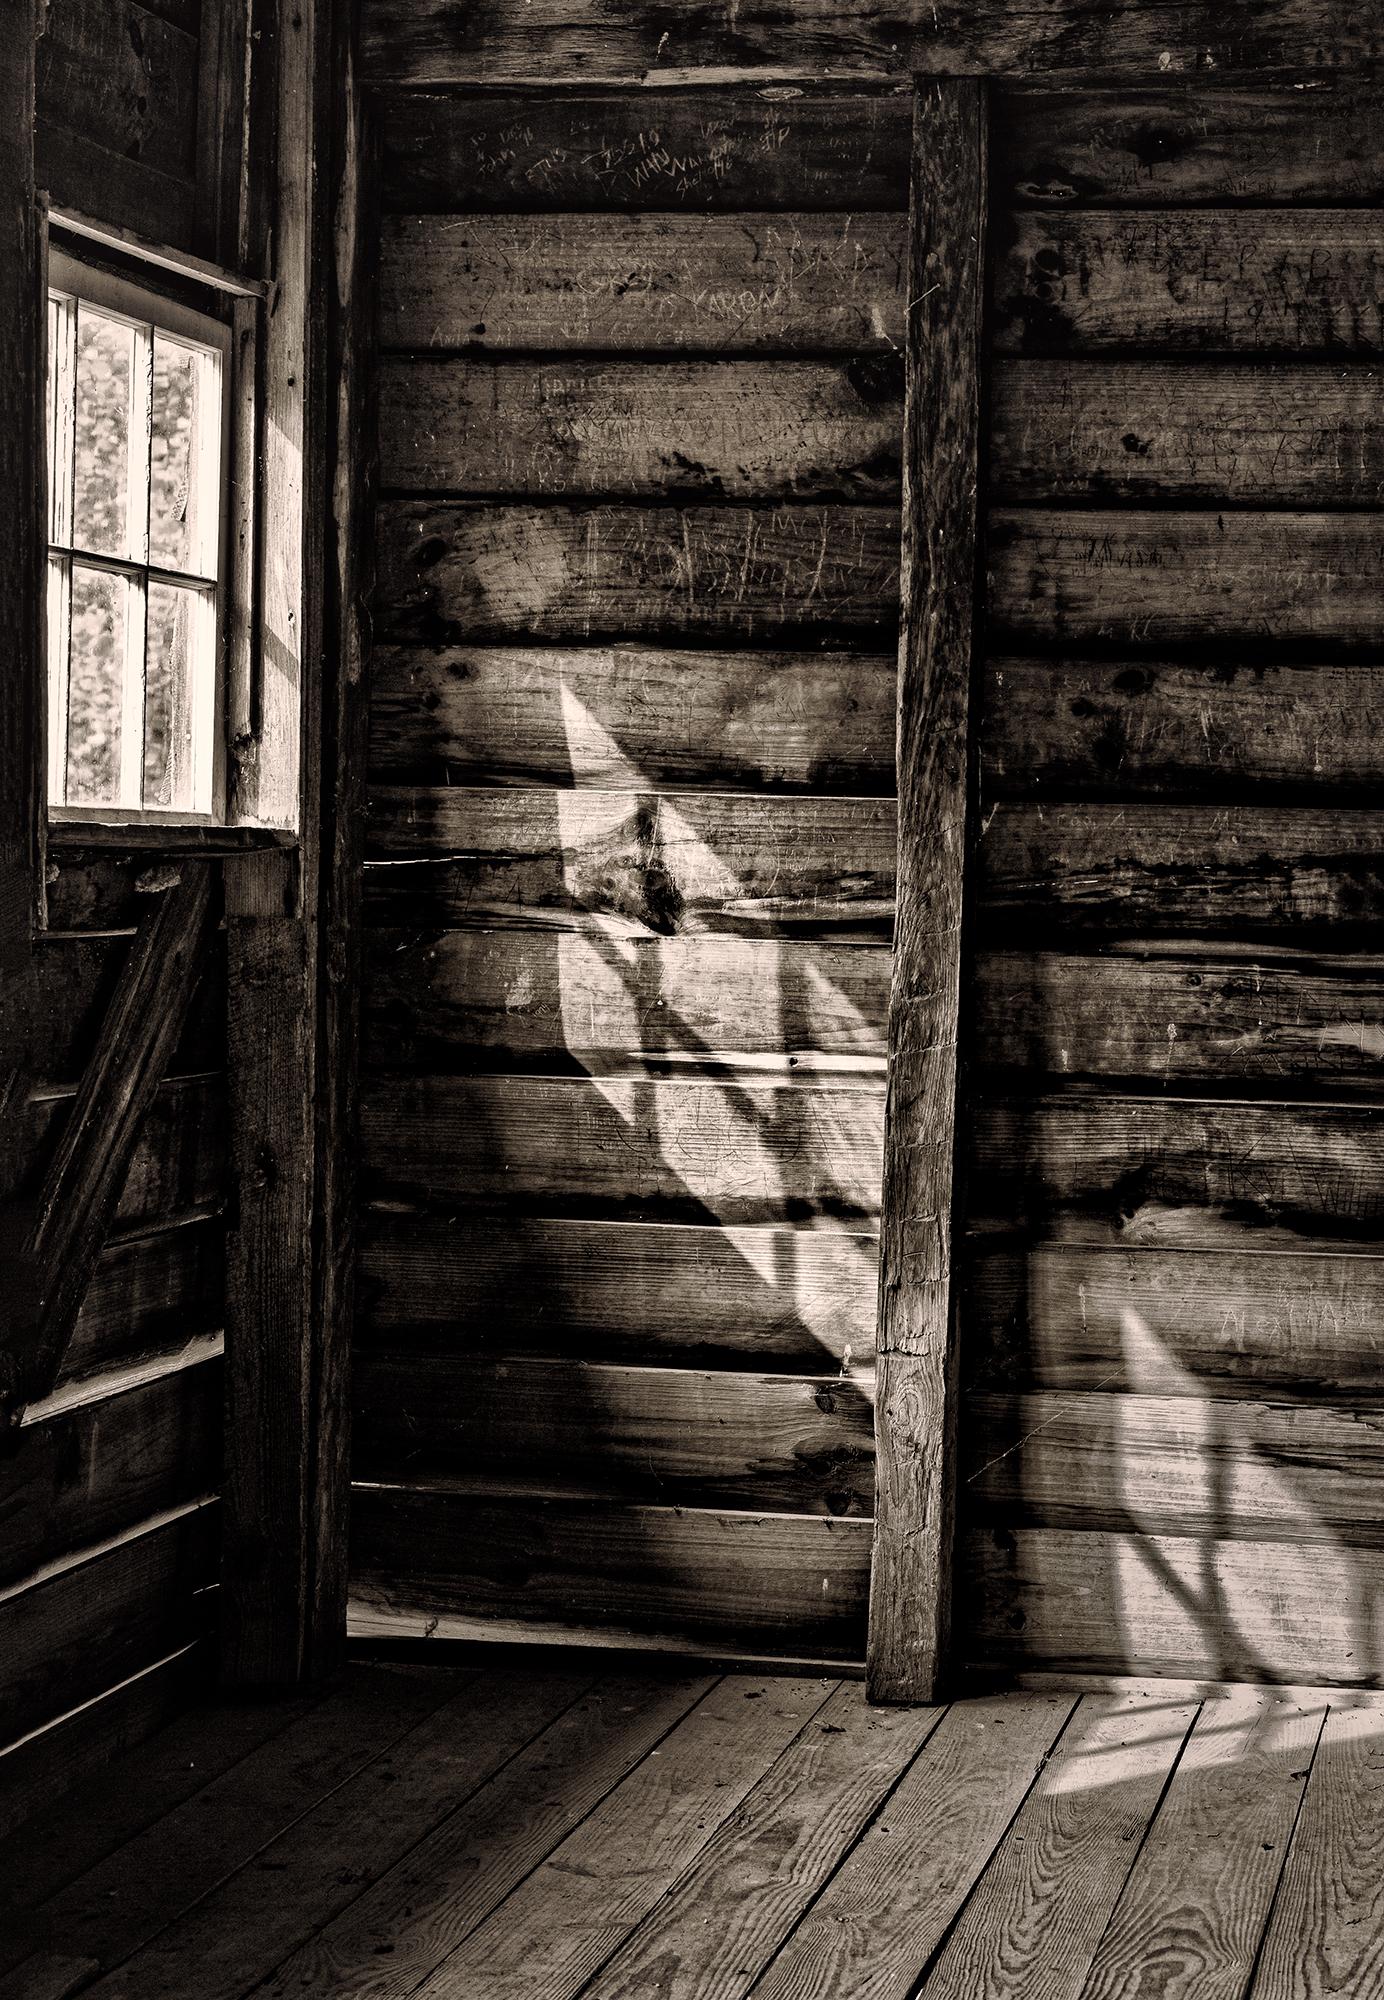 cabin reflections-B&W.jpg